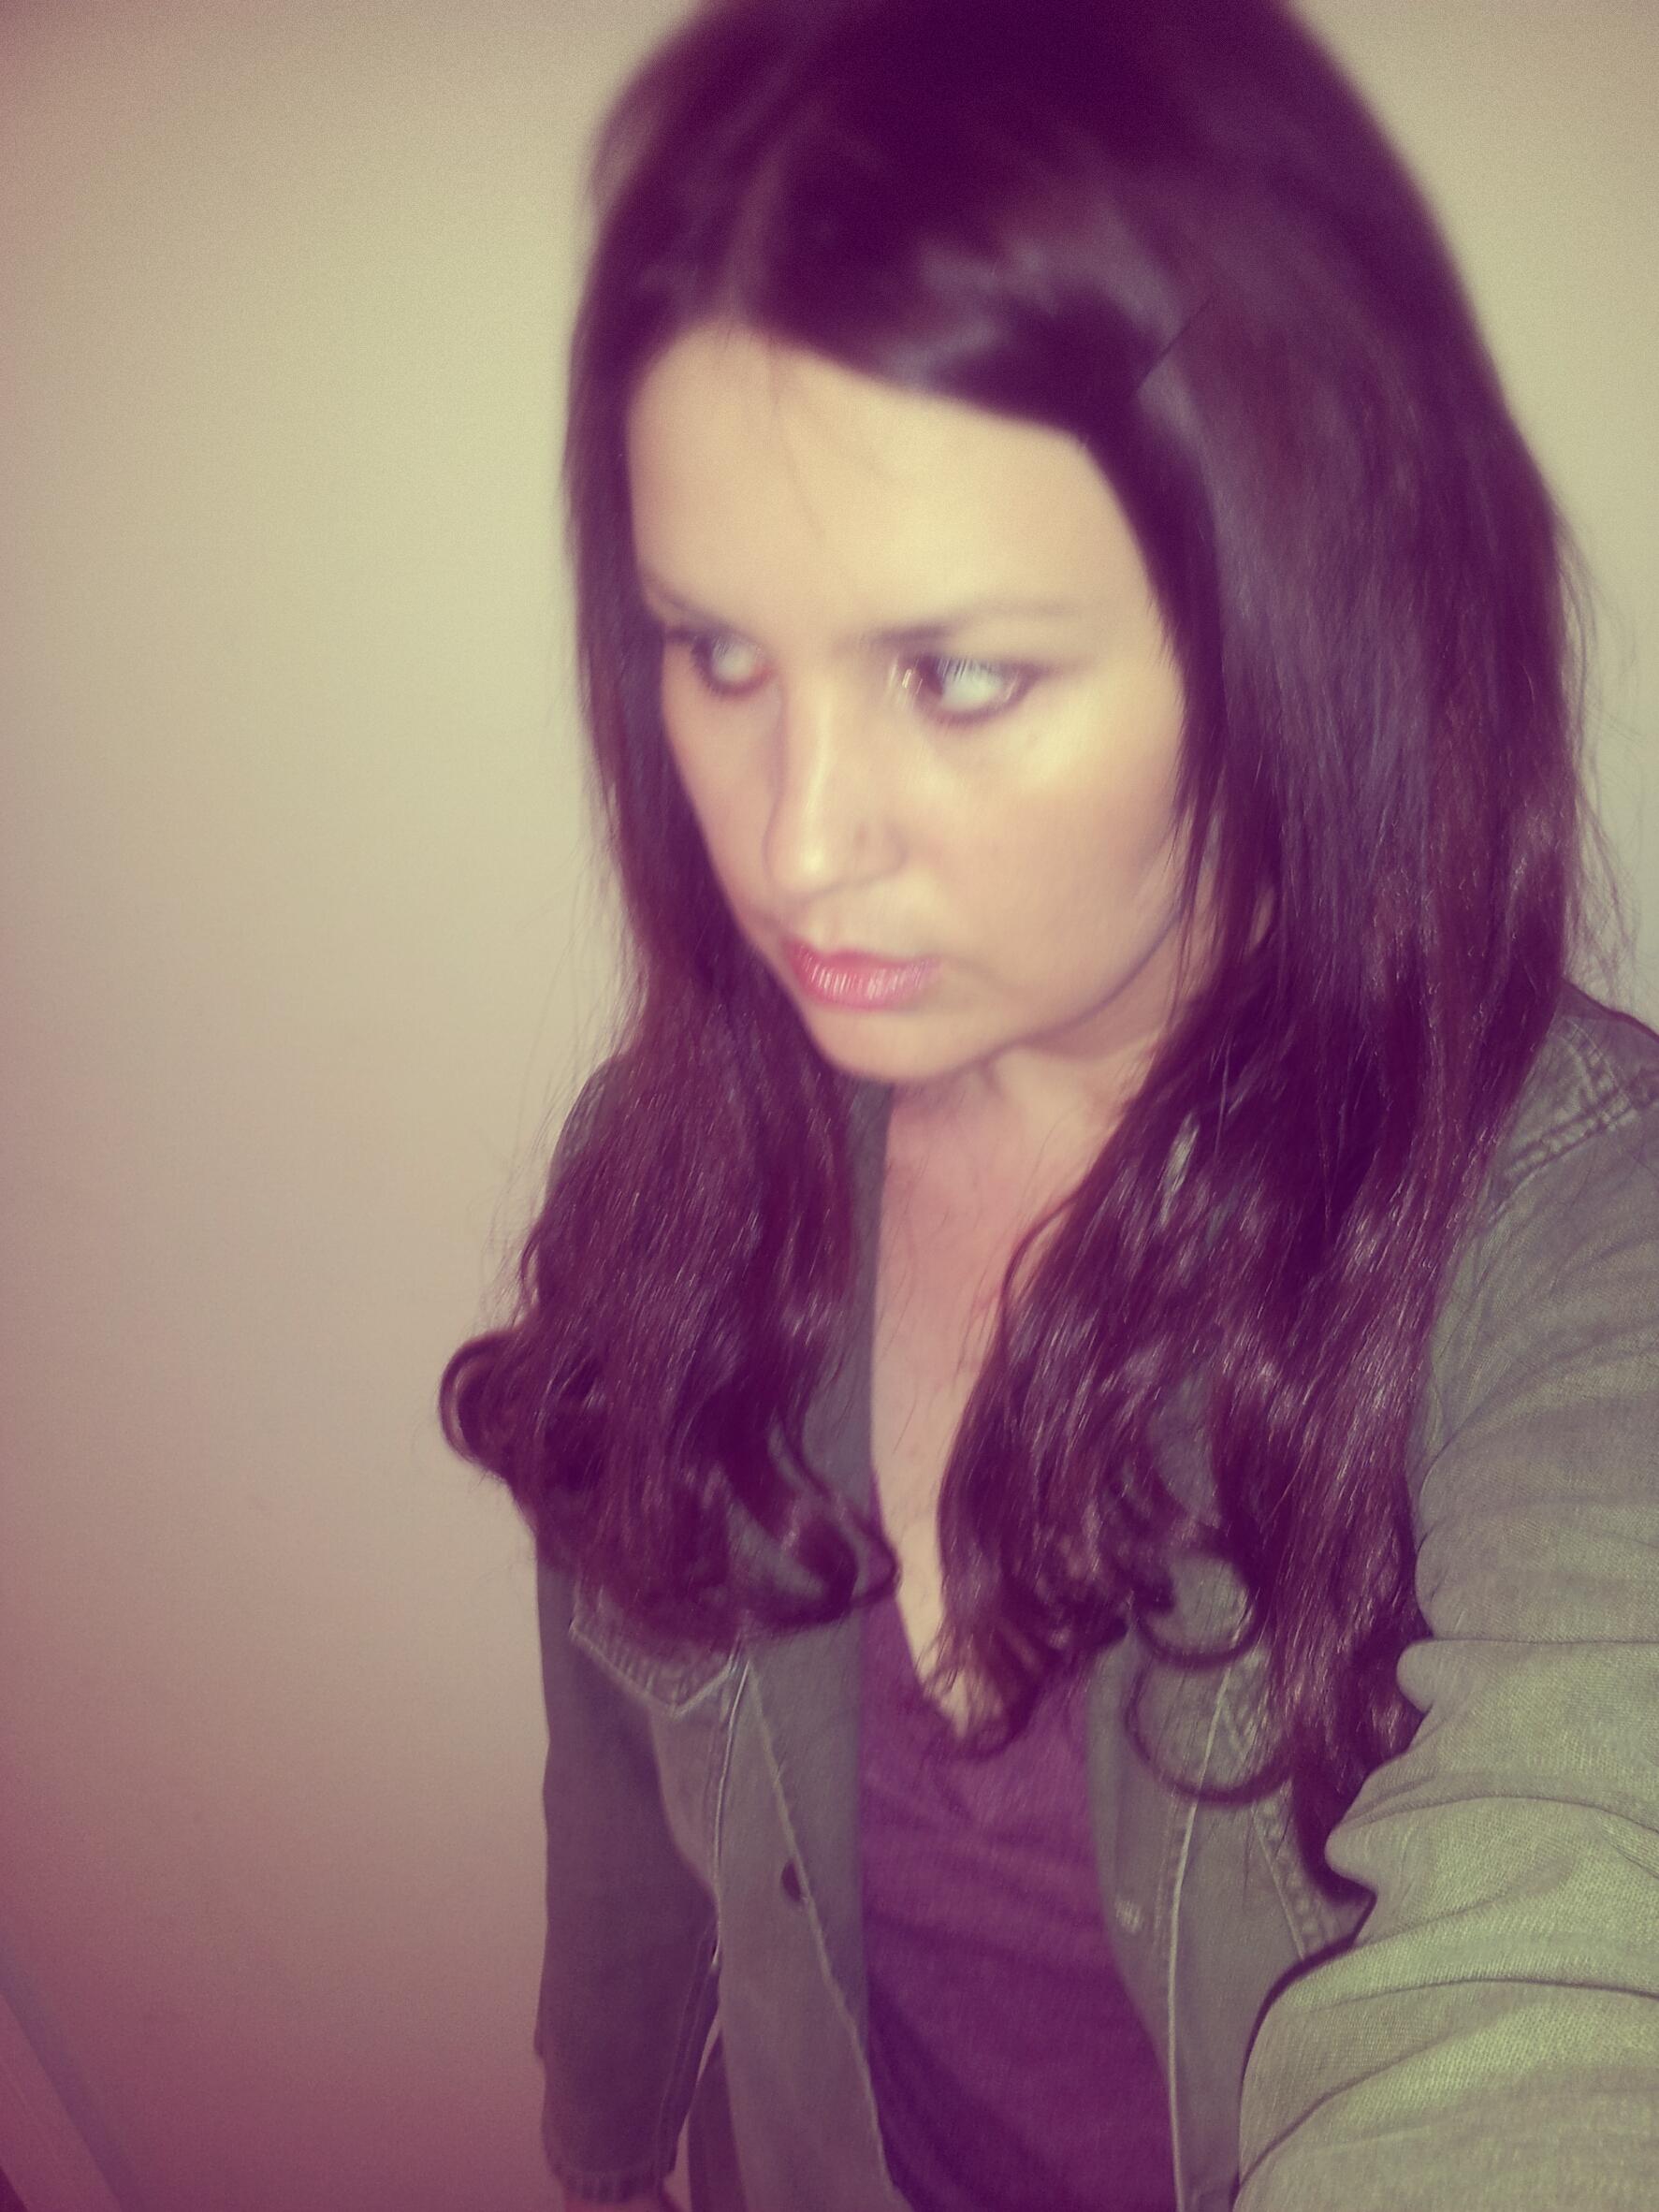 2012-03-13 15.57.48 - Melissa.jpg